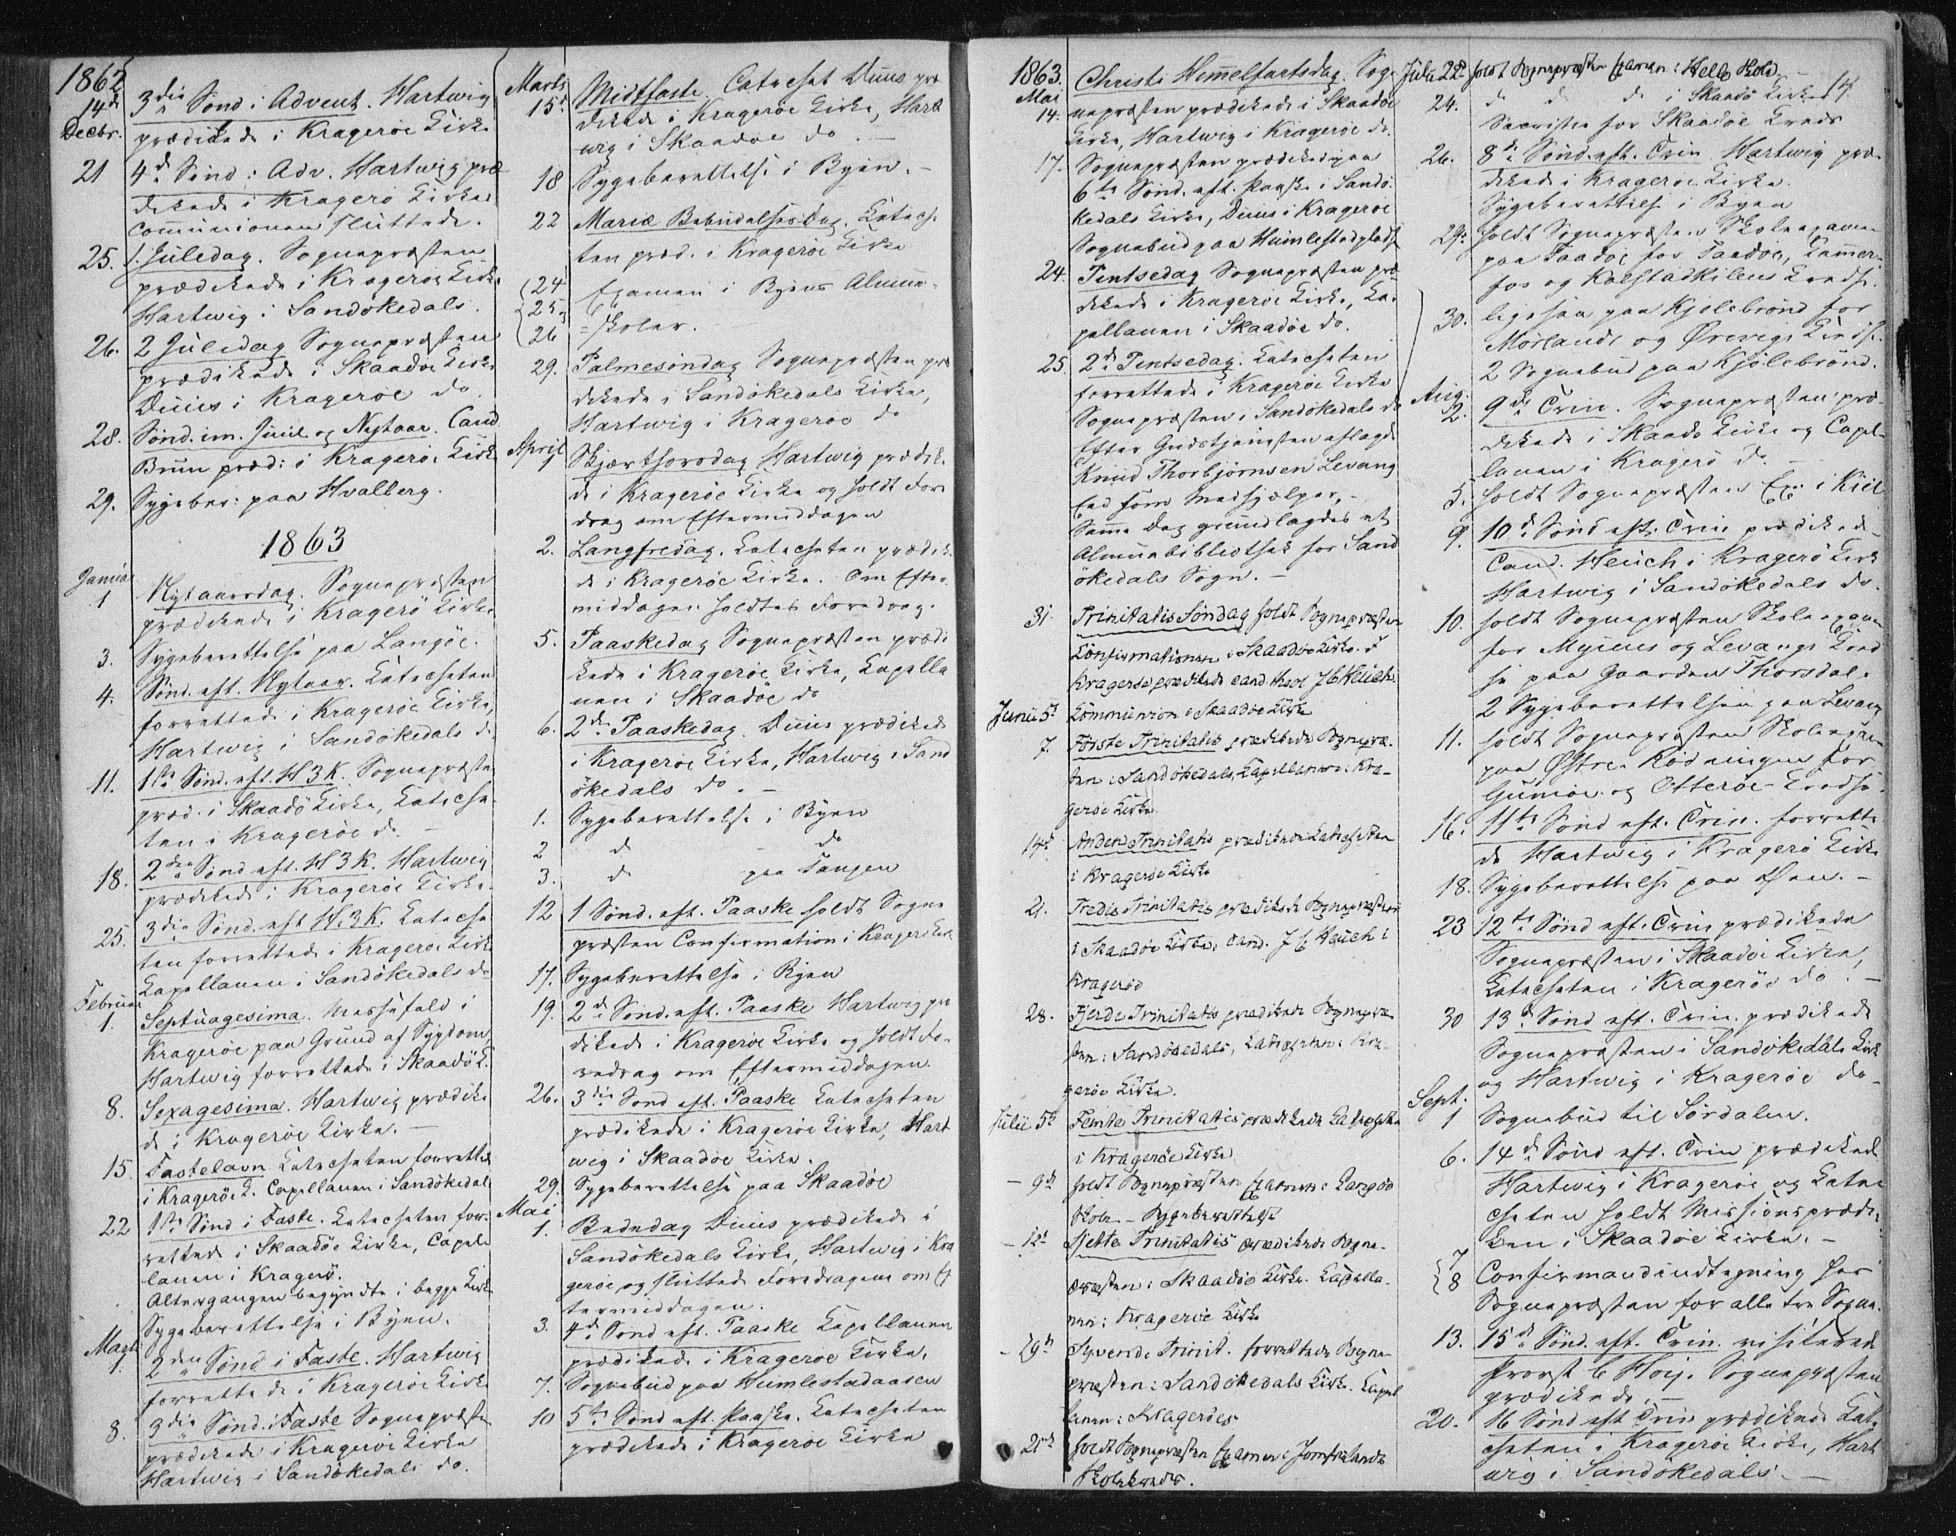 SAKO, Kragerø kirkebøker, F/Fa/L0006: Ministerialbok nr. 6, 1847-1861, s. 14